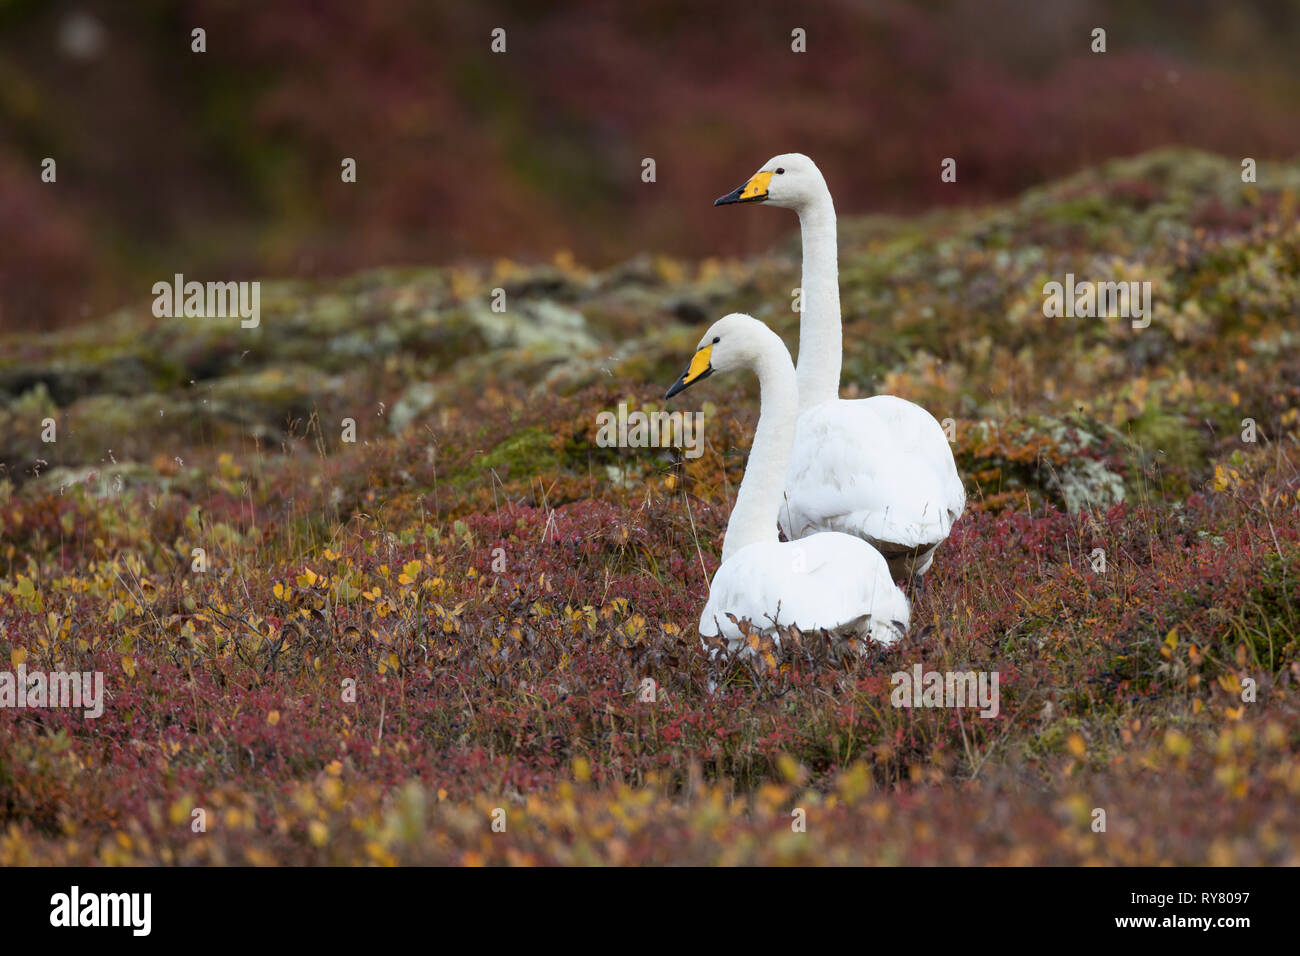 Singschwan, Sing-Schwan, Schwan, Cygnus cygnus, whooper swan, Le cygne chanteur, le cygne sauvage Stock Photo